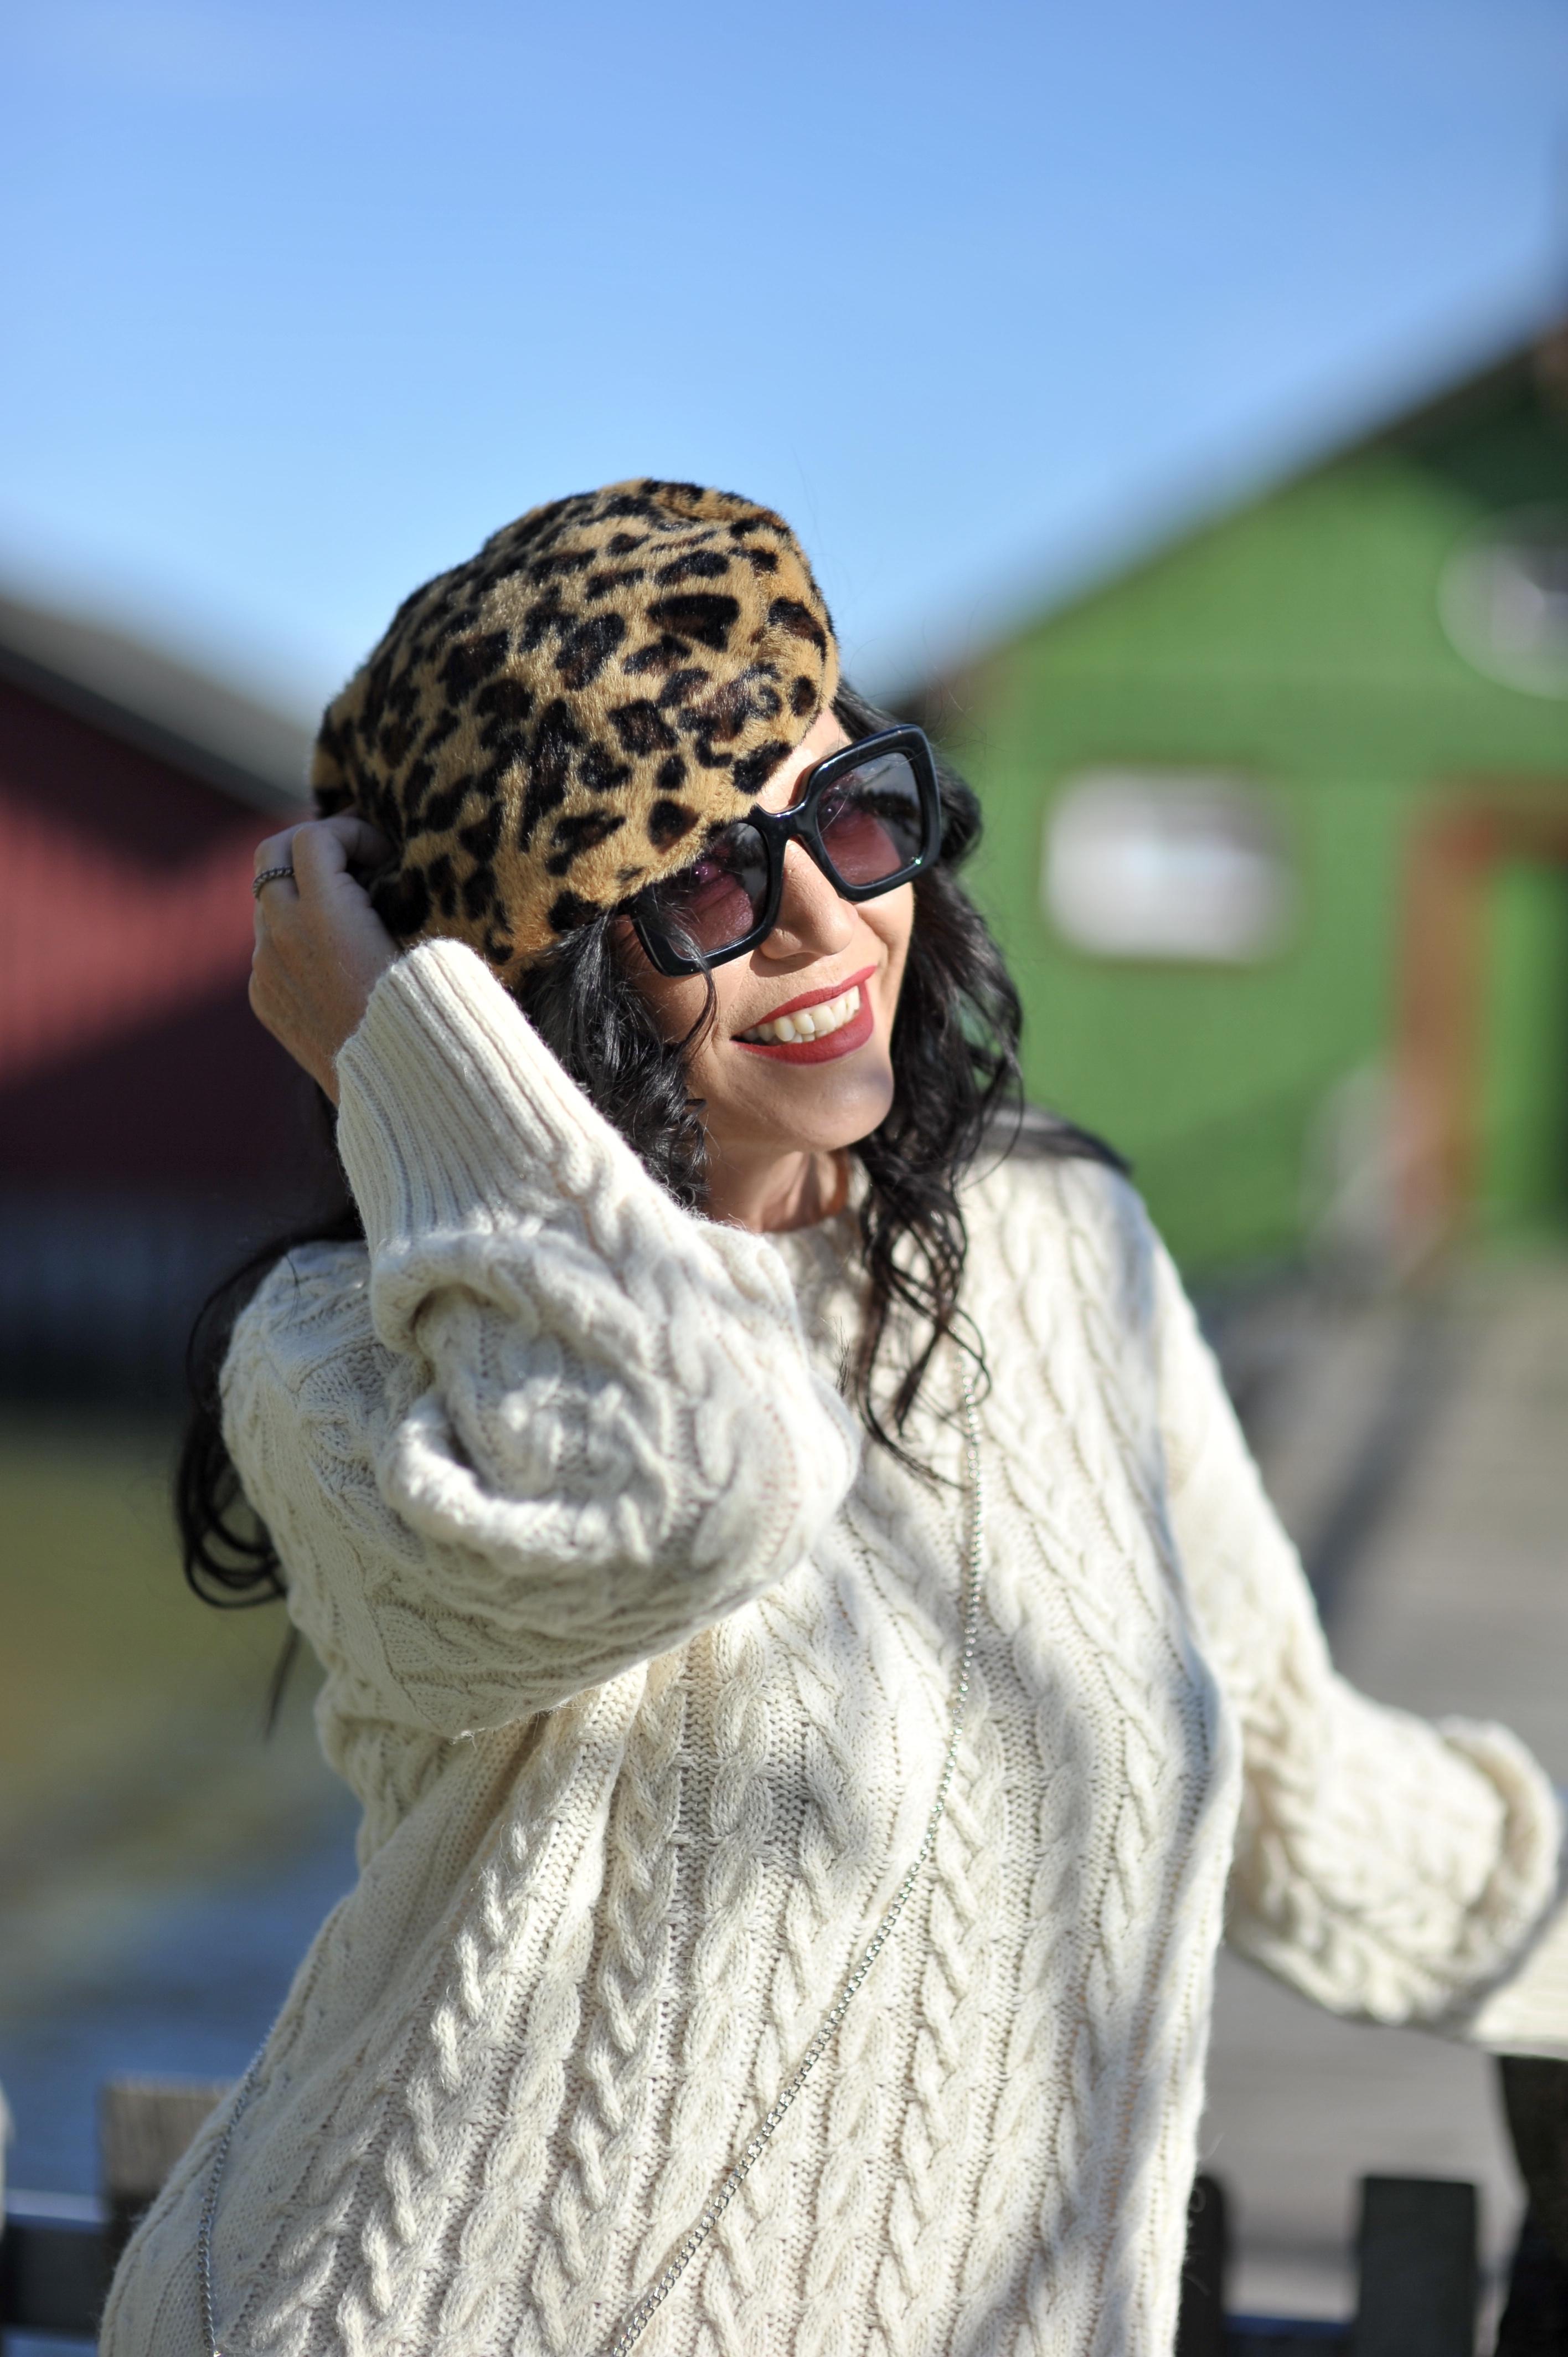 Kaos fashion, knitwear, Fashionblog Augsburg, ageless fashion, Leo hat, Antonello Serio, Eyewearblogger, mystyle, style for Ladies, Damenmode, Designerwear, Sonnenbrillen, Brillenblogger, Yoox Stiefel, Yoox Boots, Herbstmode, trends2019, Fashion, Style